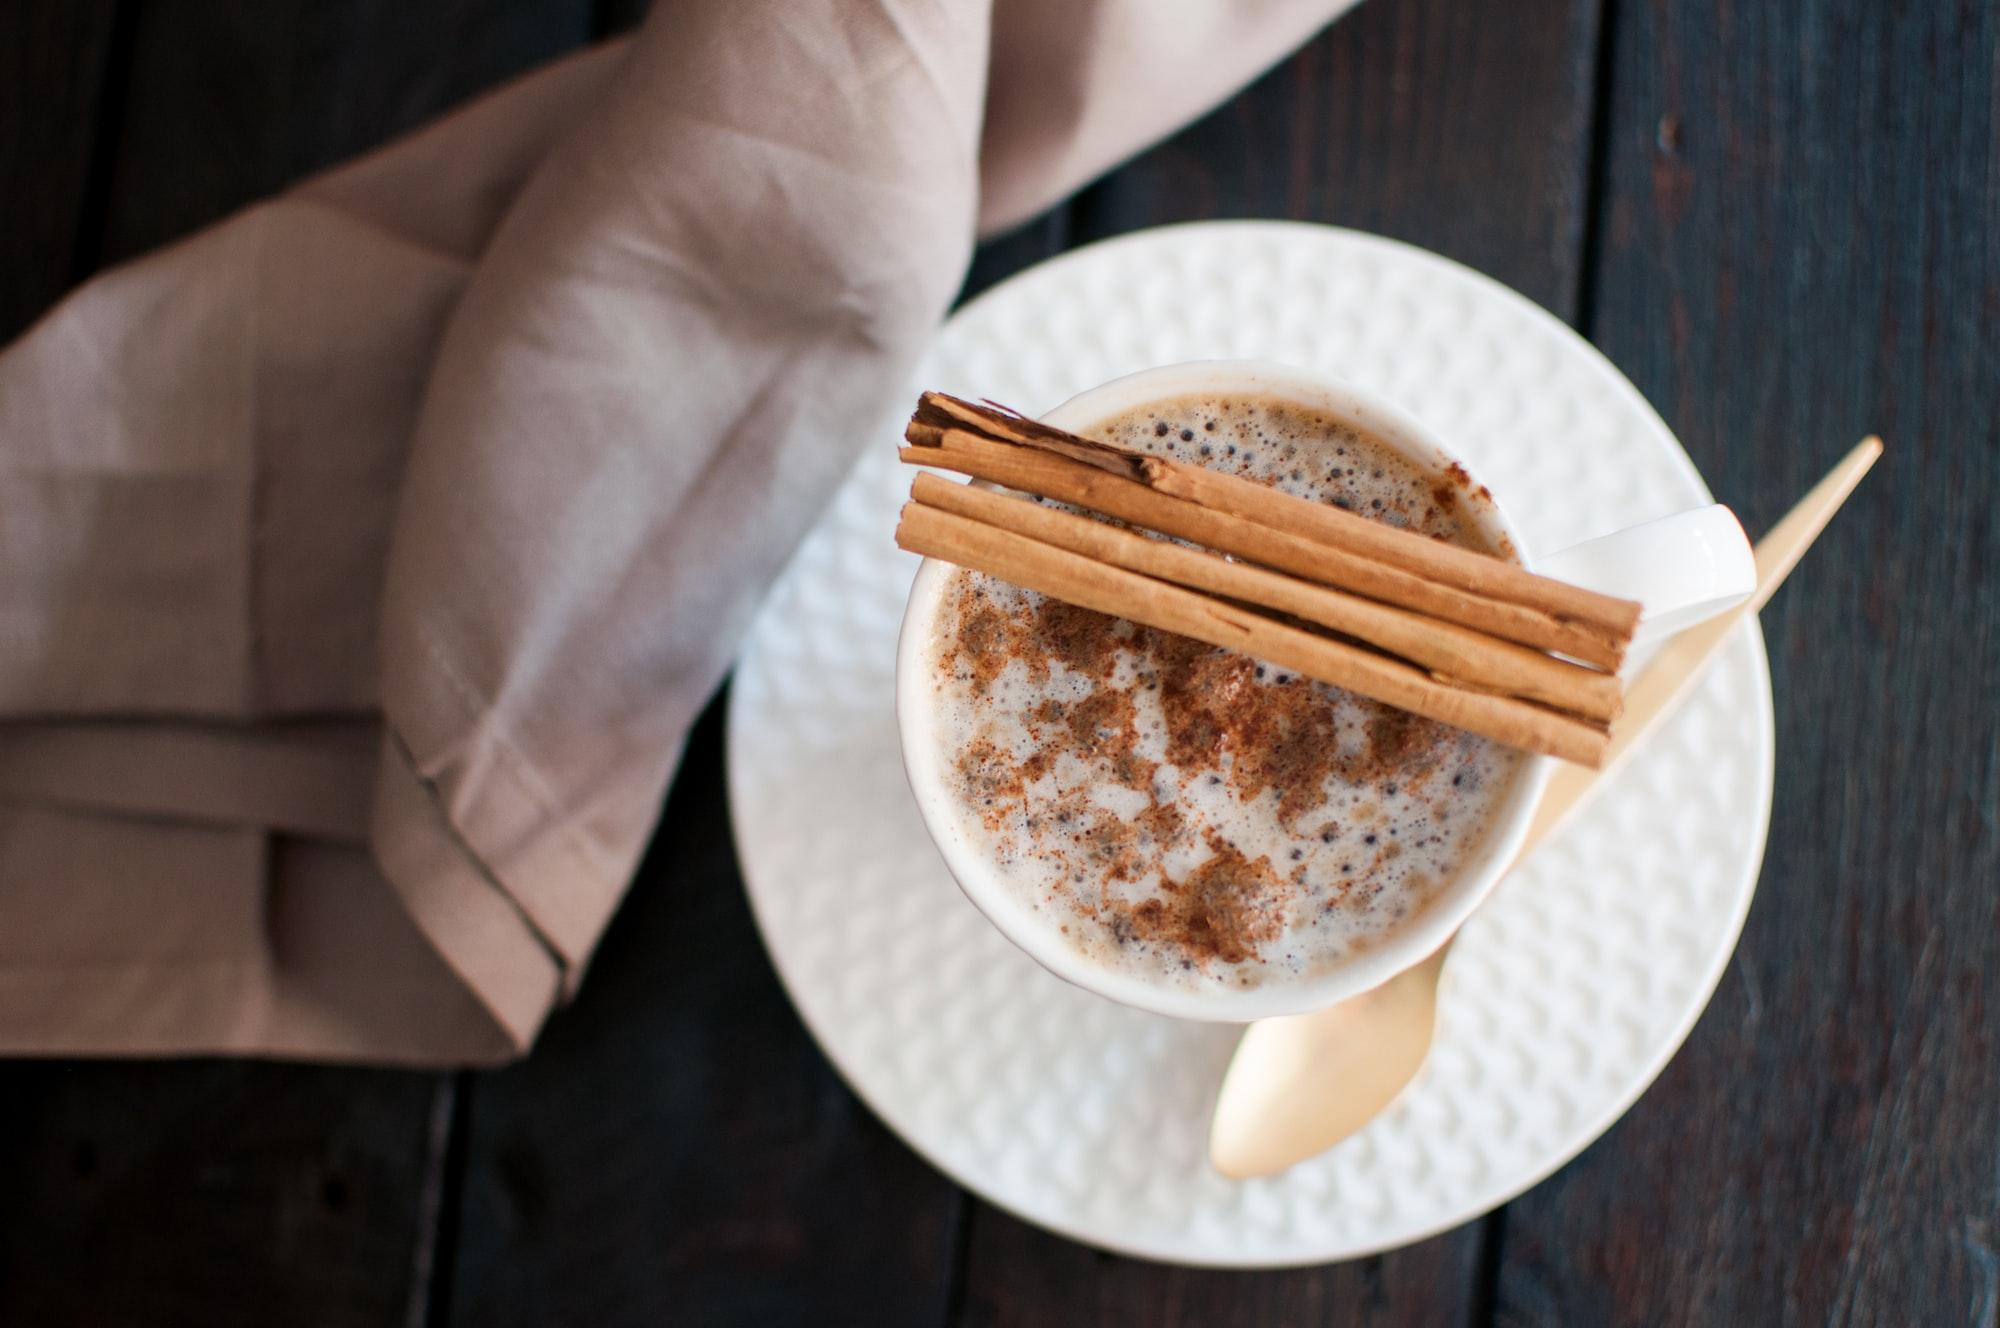 Coffe with cinnamon II